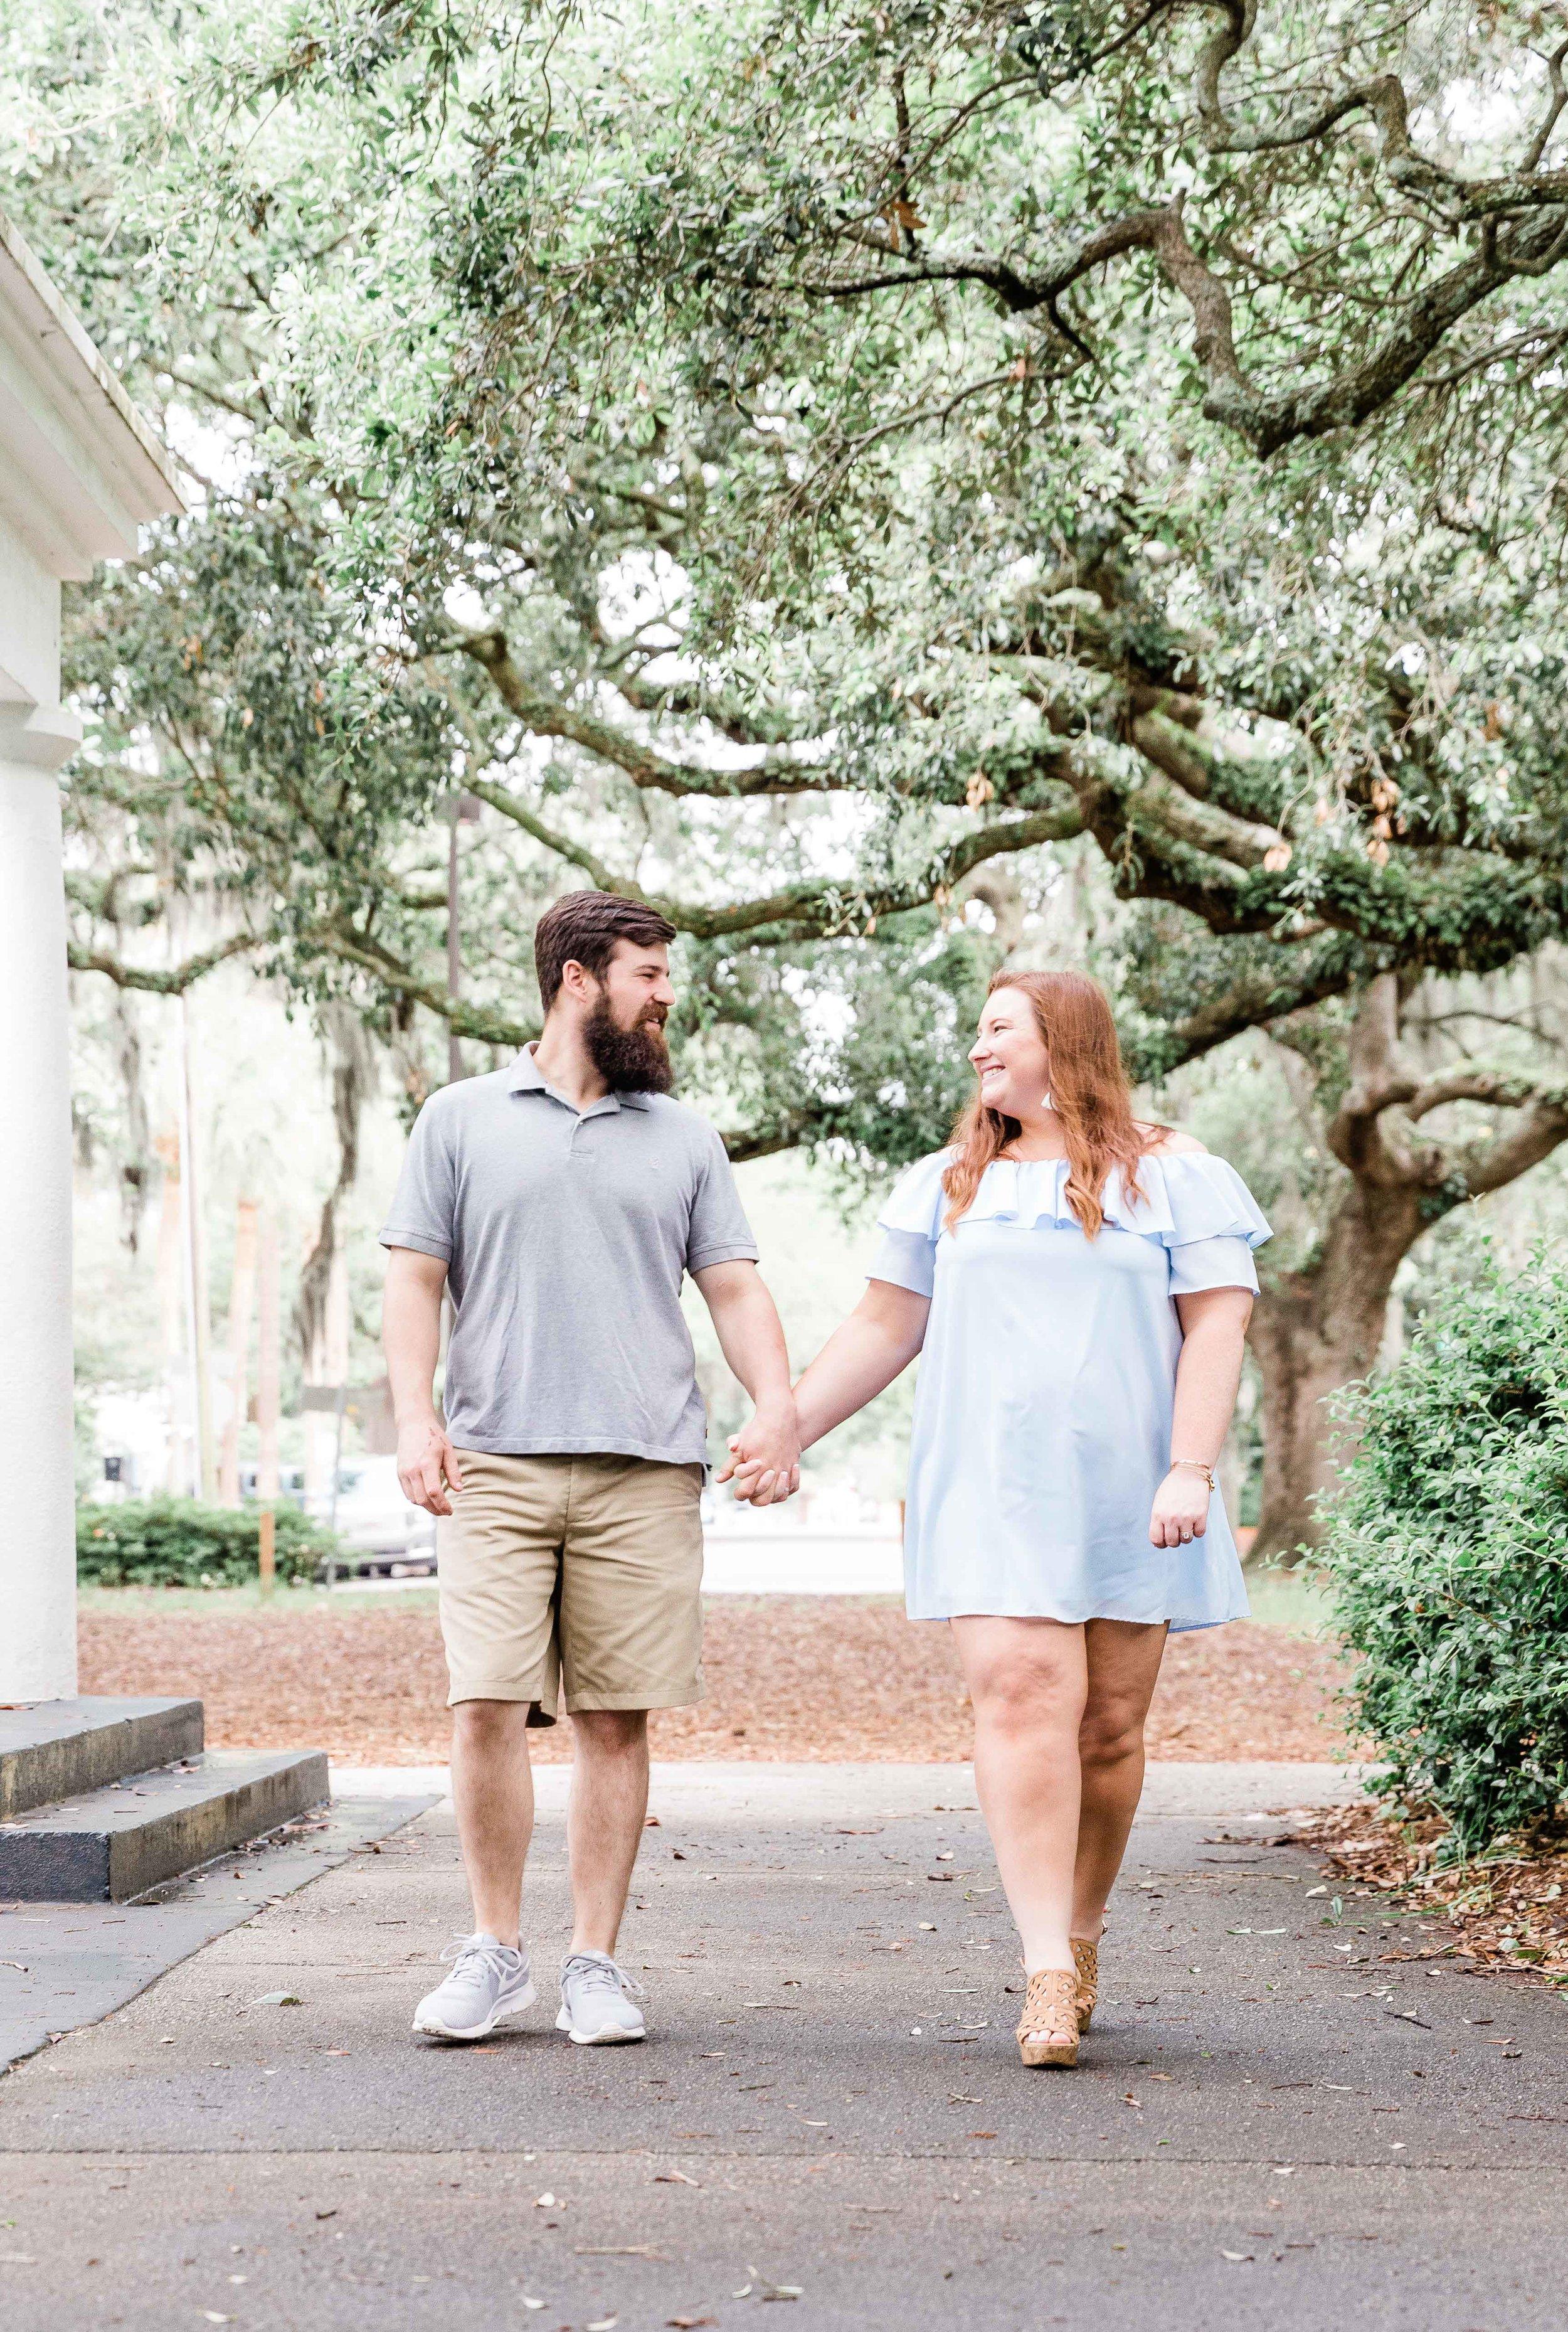 20190505-Southern Lens Photography- Savannah Wedding Photographer-Screven and Caroline-201907.jpg